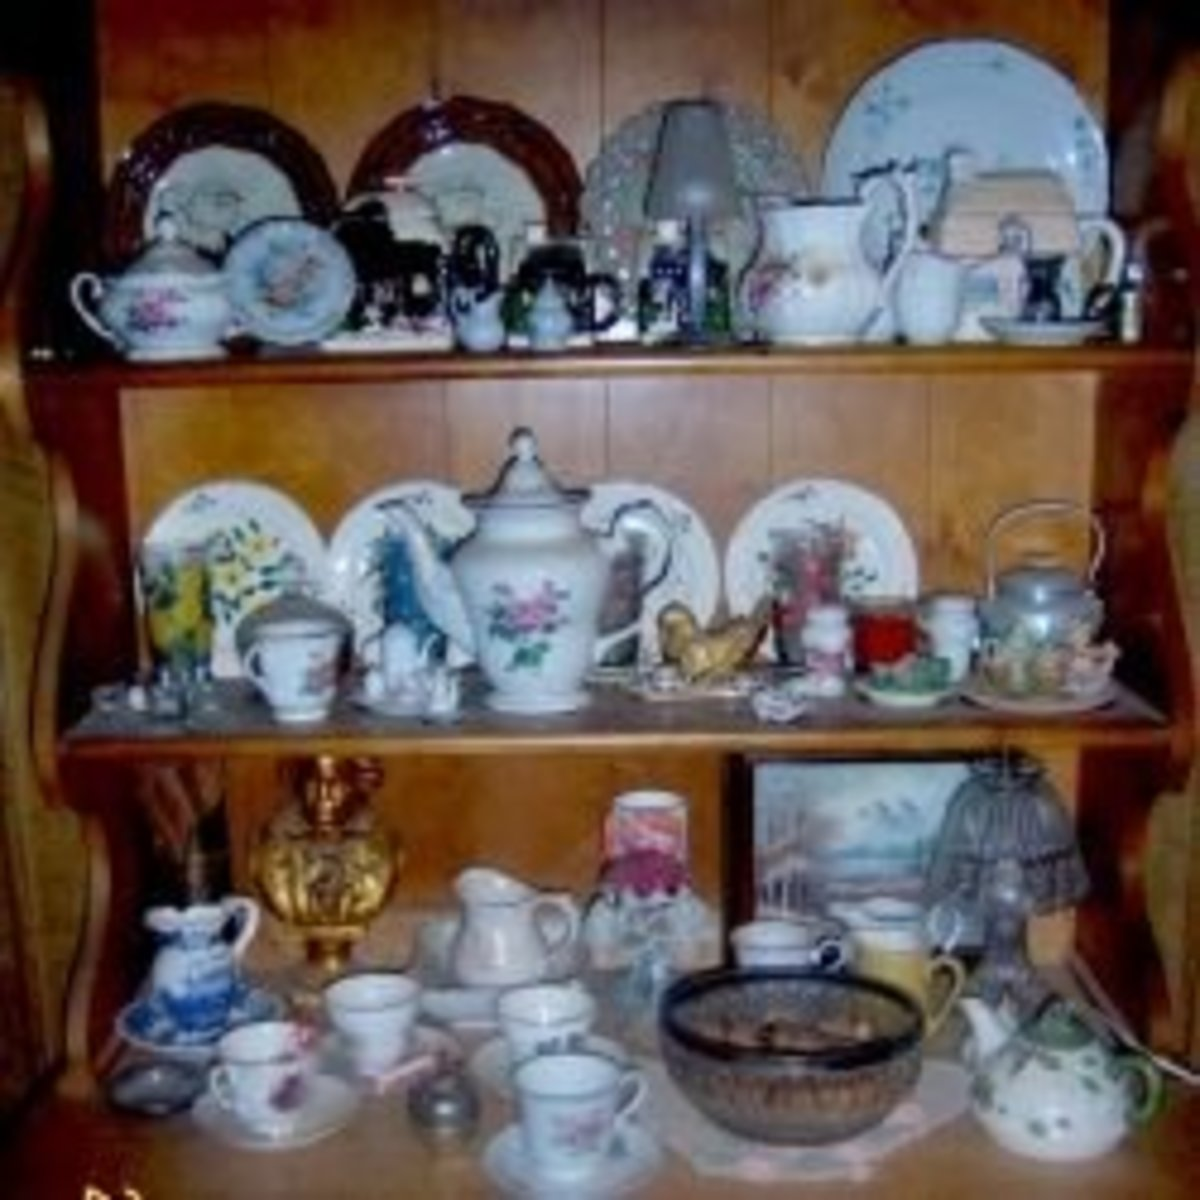 Repurposed teacups